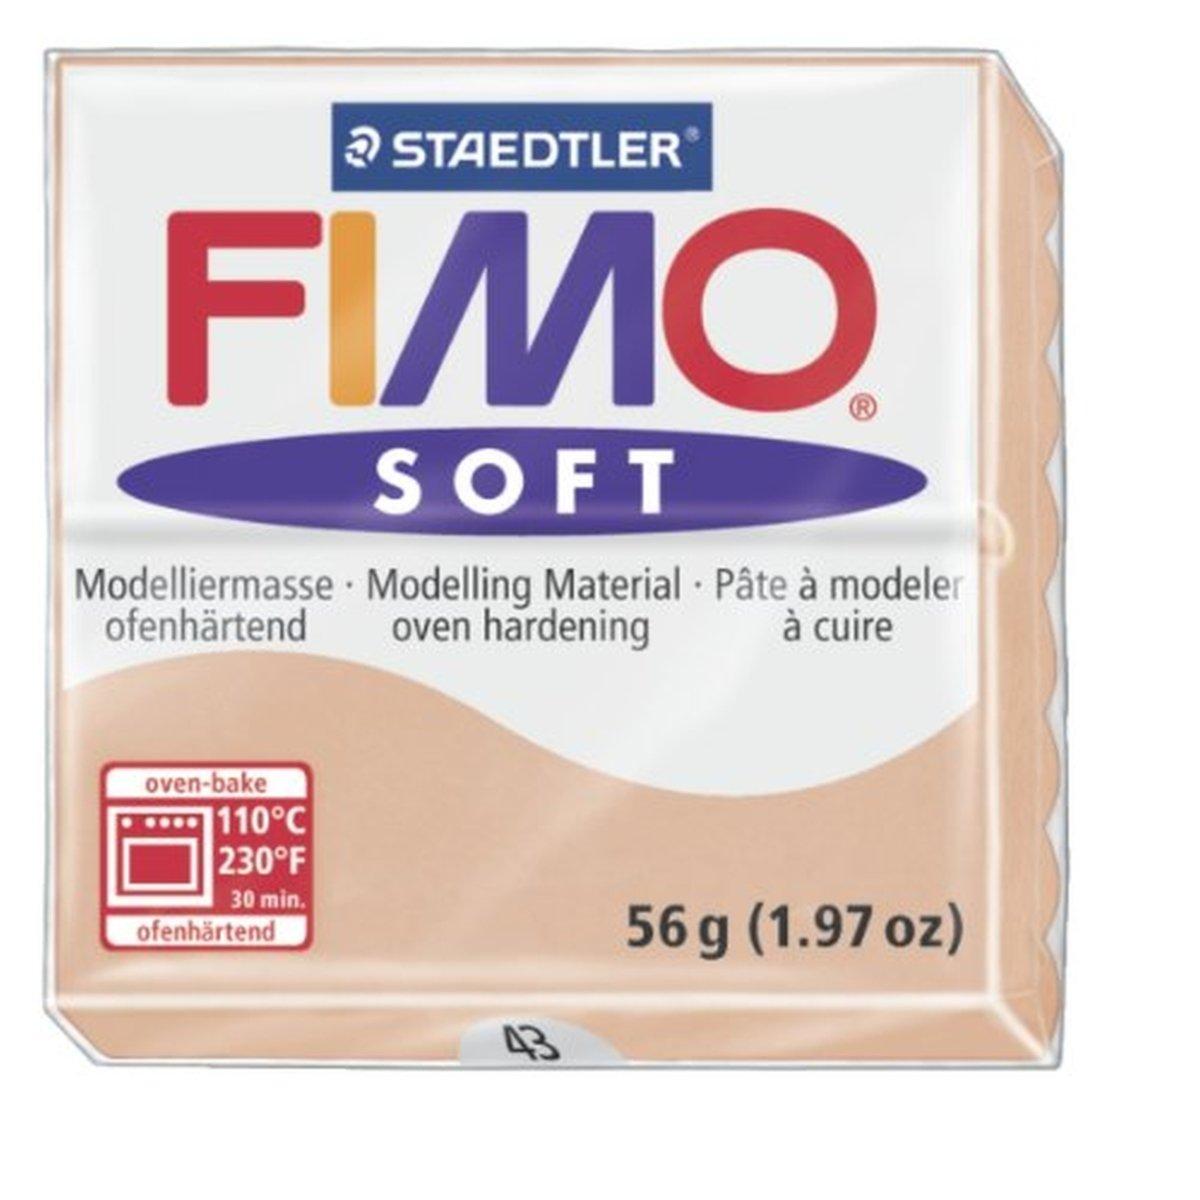 Staedtler Fimo suave carne (43) para horno Bake modelado de modelar arcilla bloque de polímero de color 56 G (, 1 unidades)